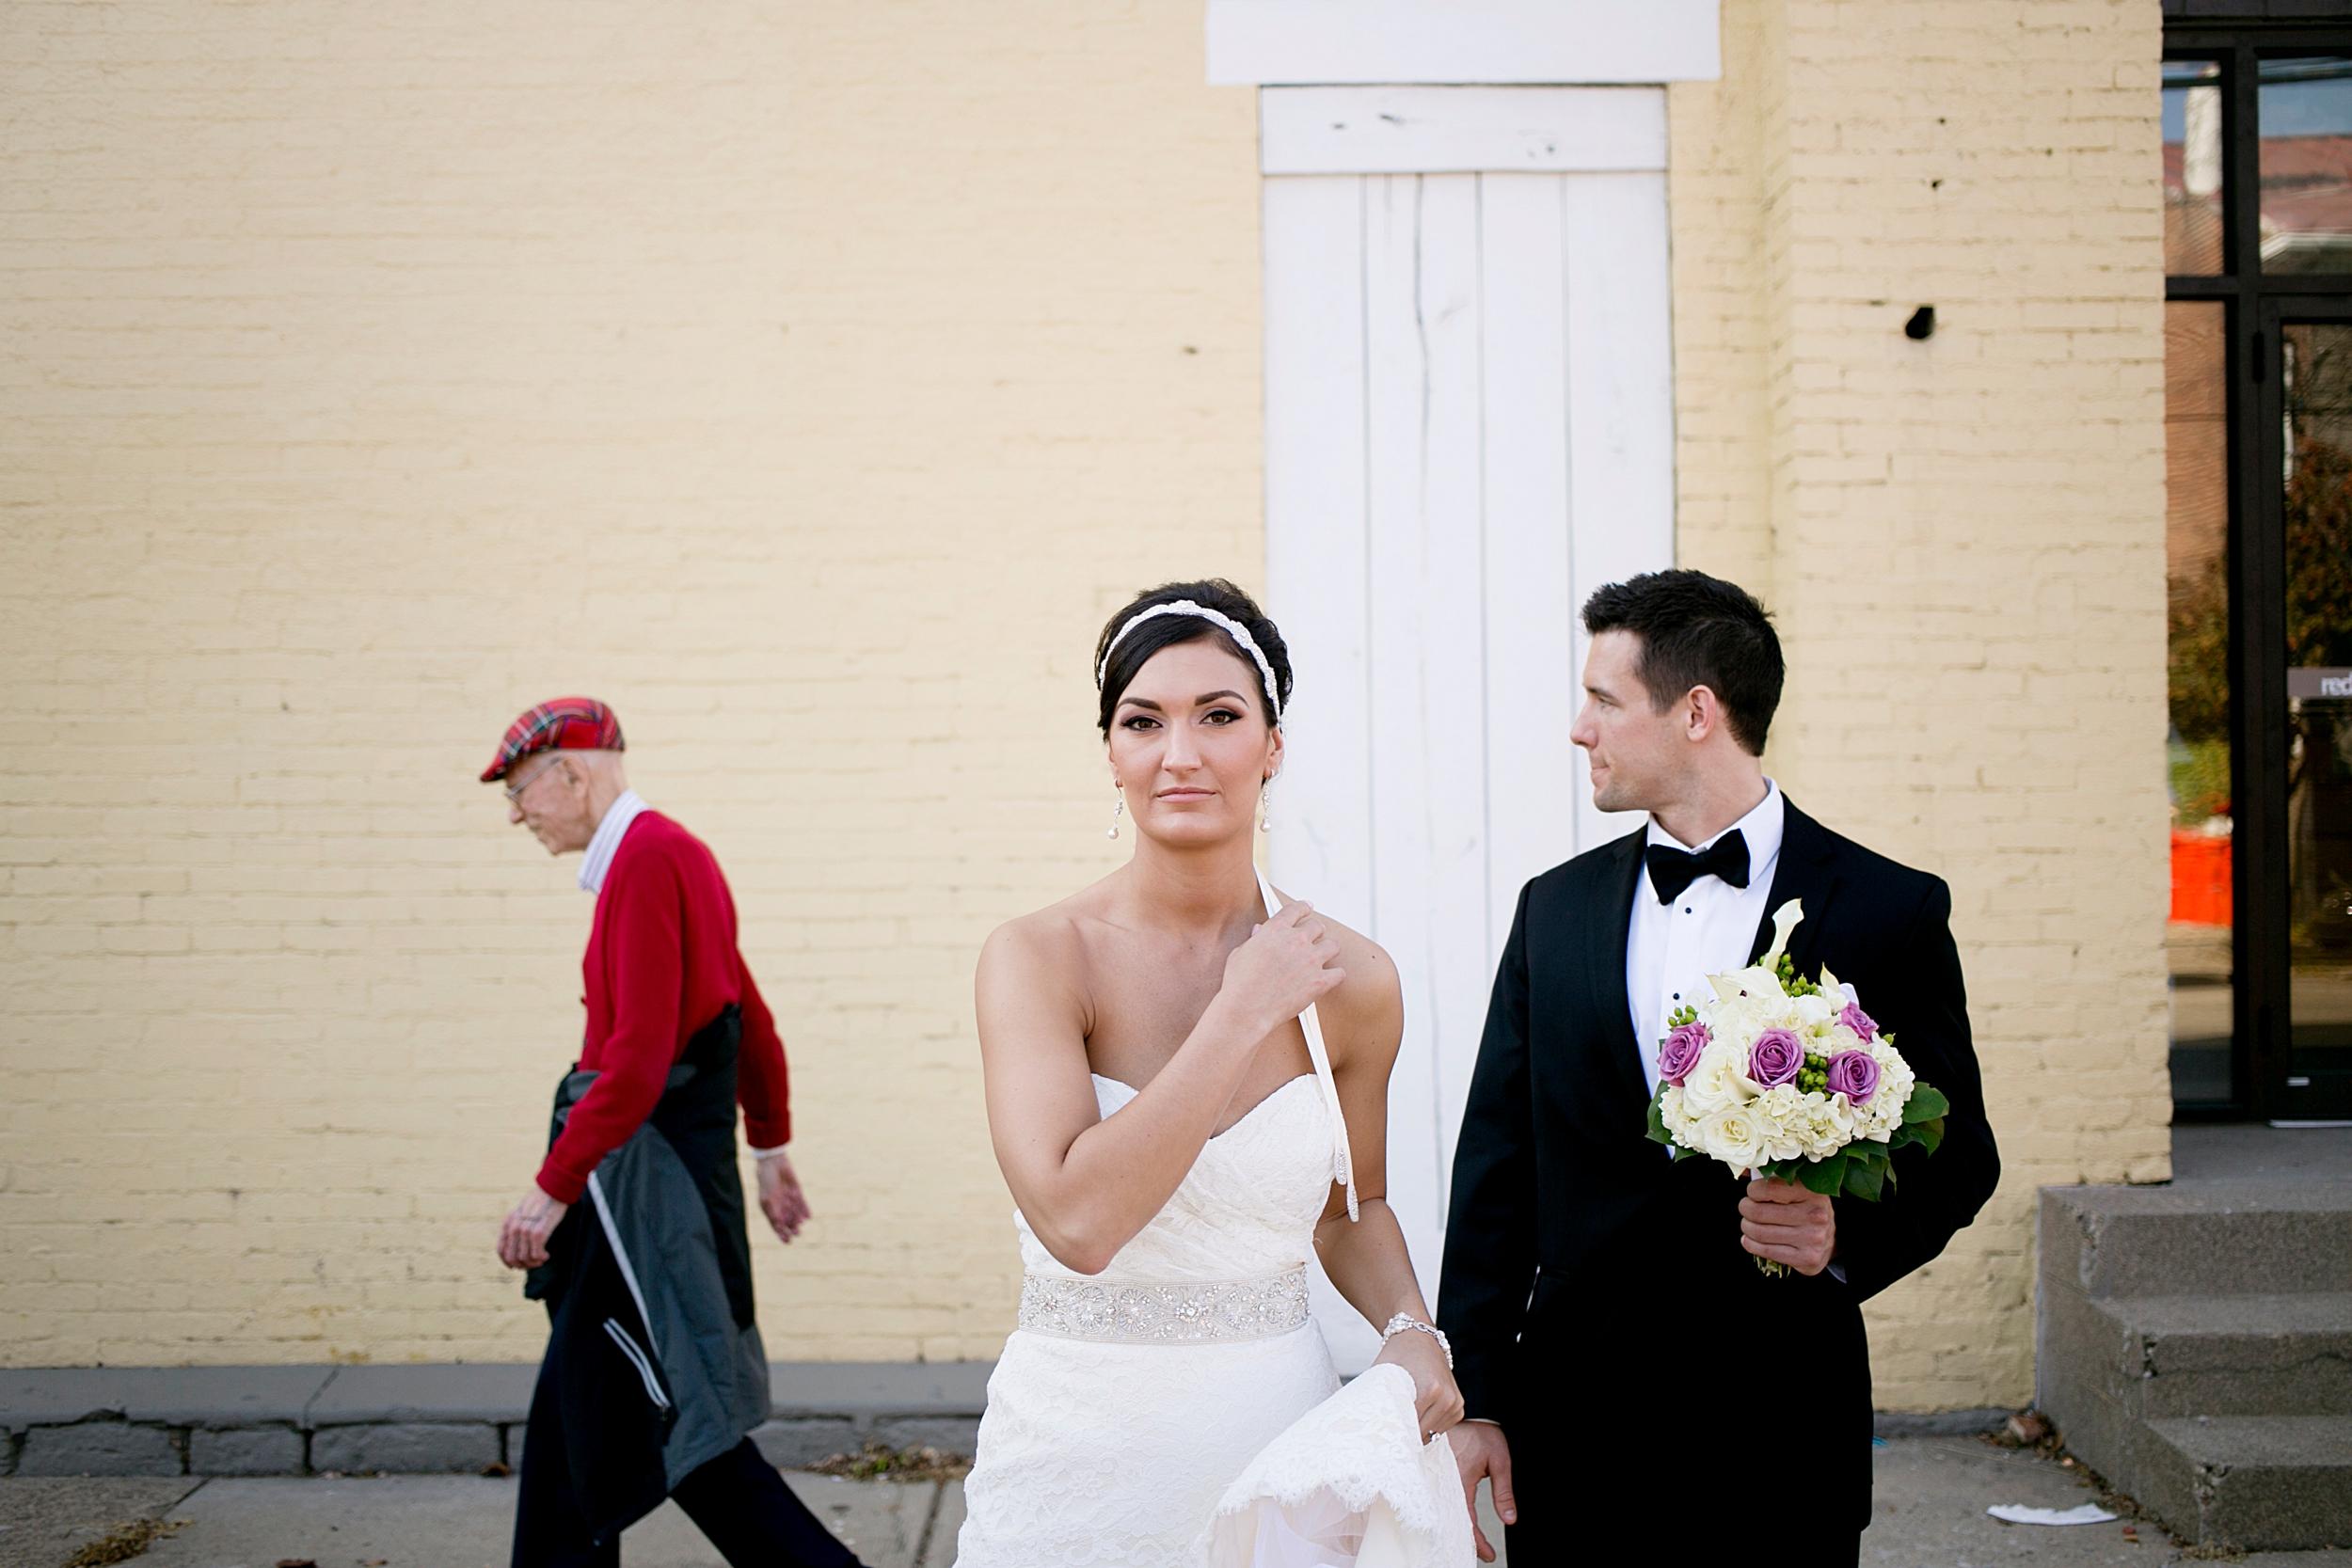 32-downtown-louisville-rustic-wedding-portrait.JPG